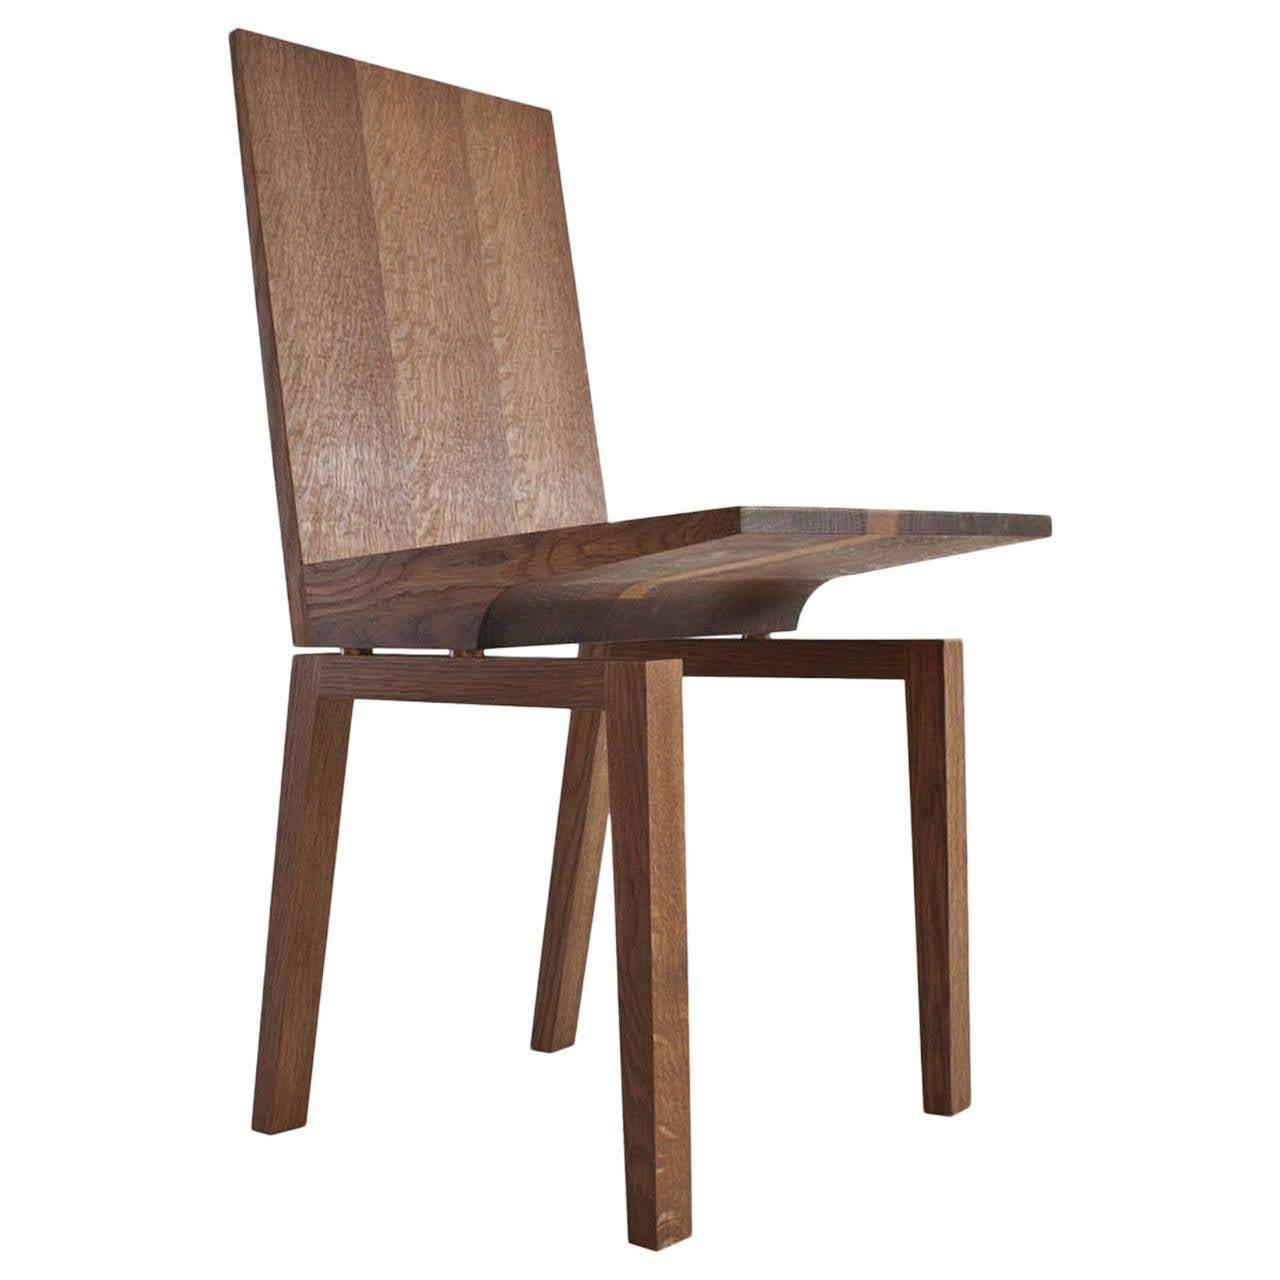 Corbett Dining Chair in Solid White Oak with Bronze Standoffs